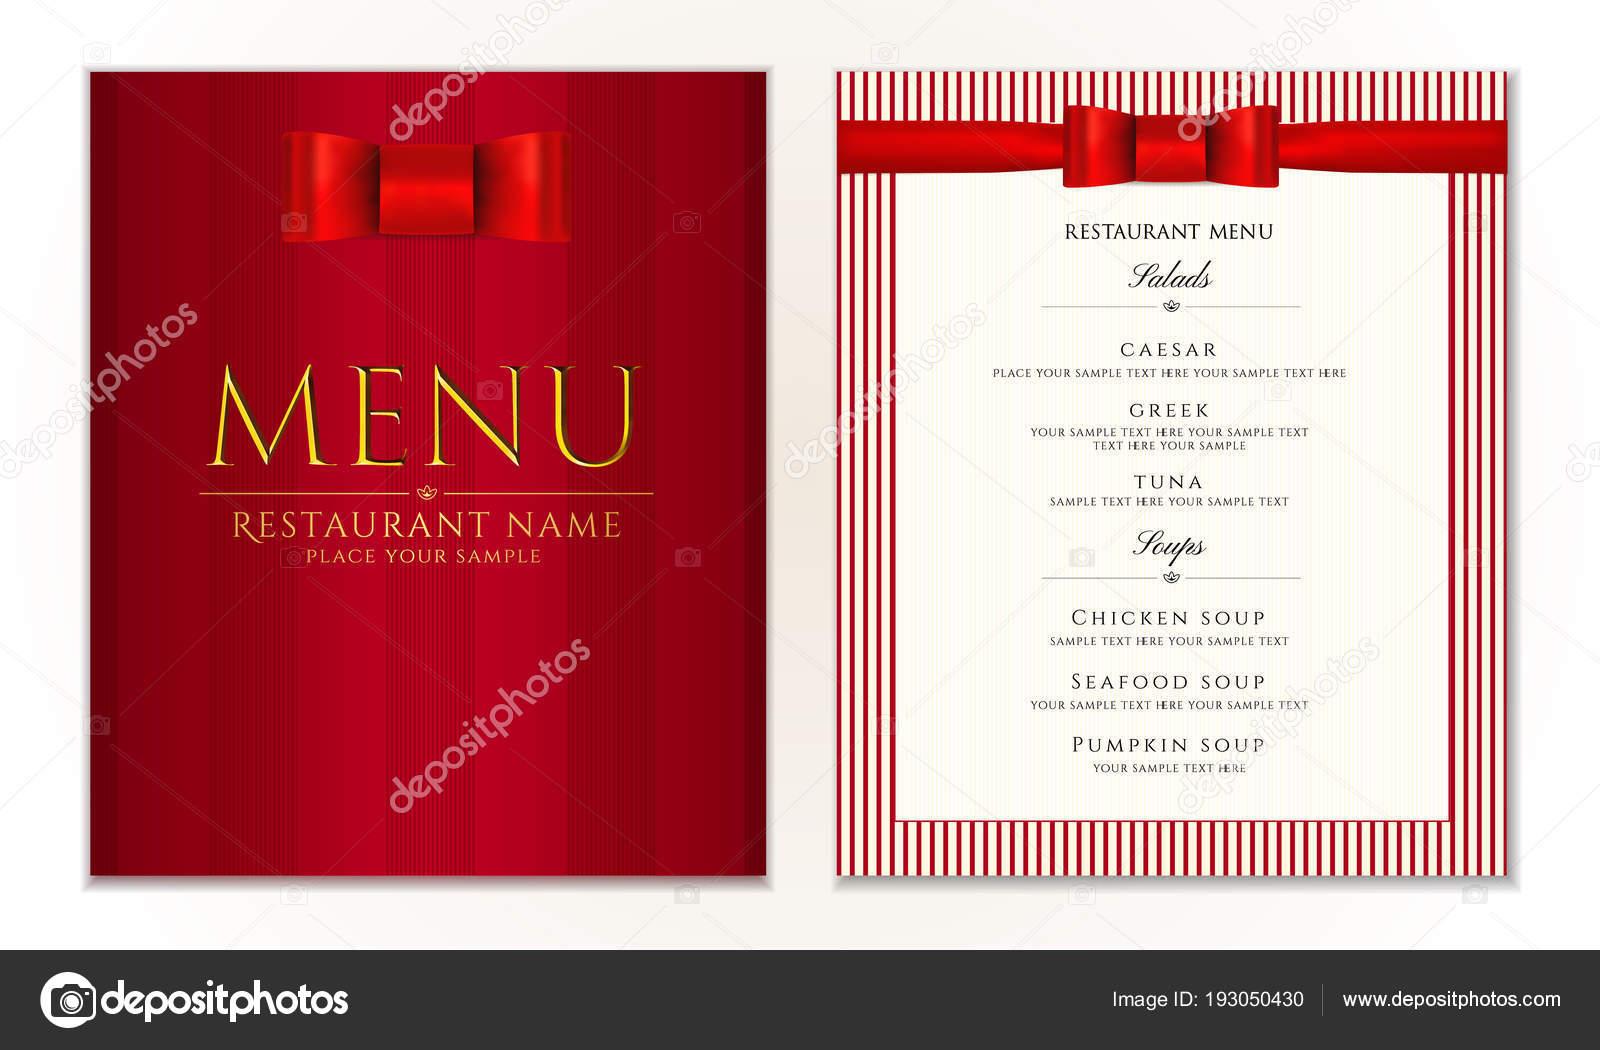 Design Restaurant Menu Template Red Bow Ribbon Strips Elegant Luxe ...